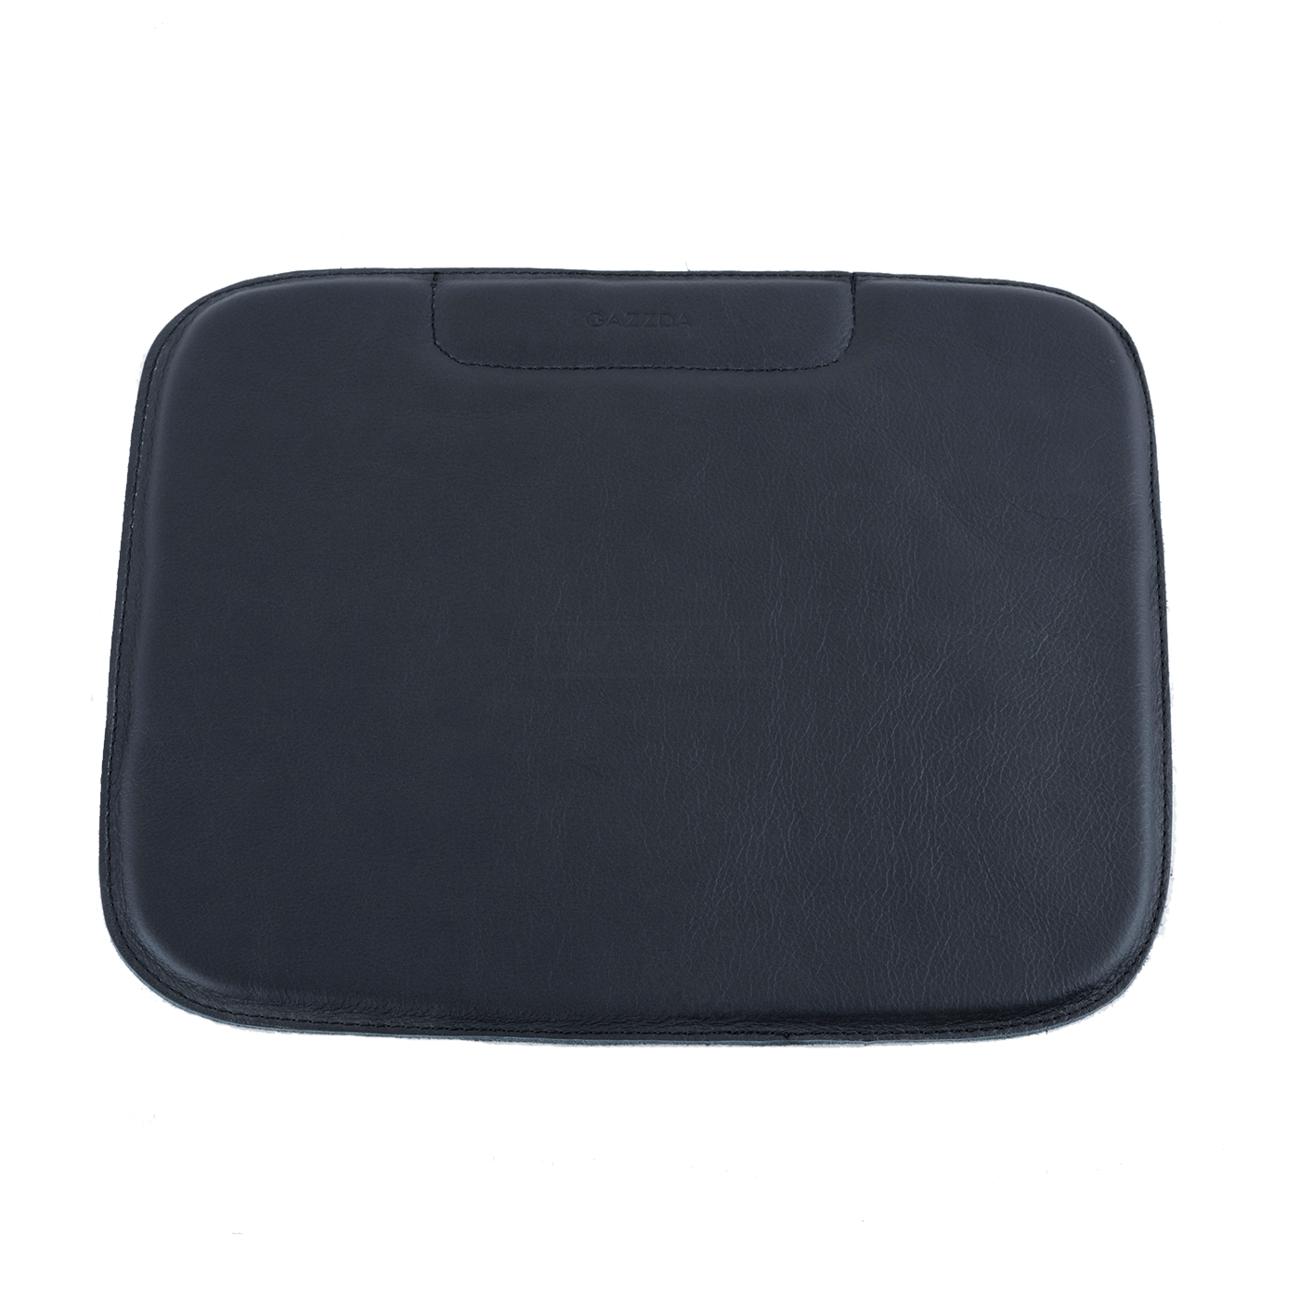 https://www.fundesign.nl/media/catalog/product/g/a/gazzda-zitkussen-voor-leina-bar-chair-dakar-31_black.png